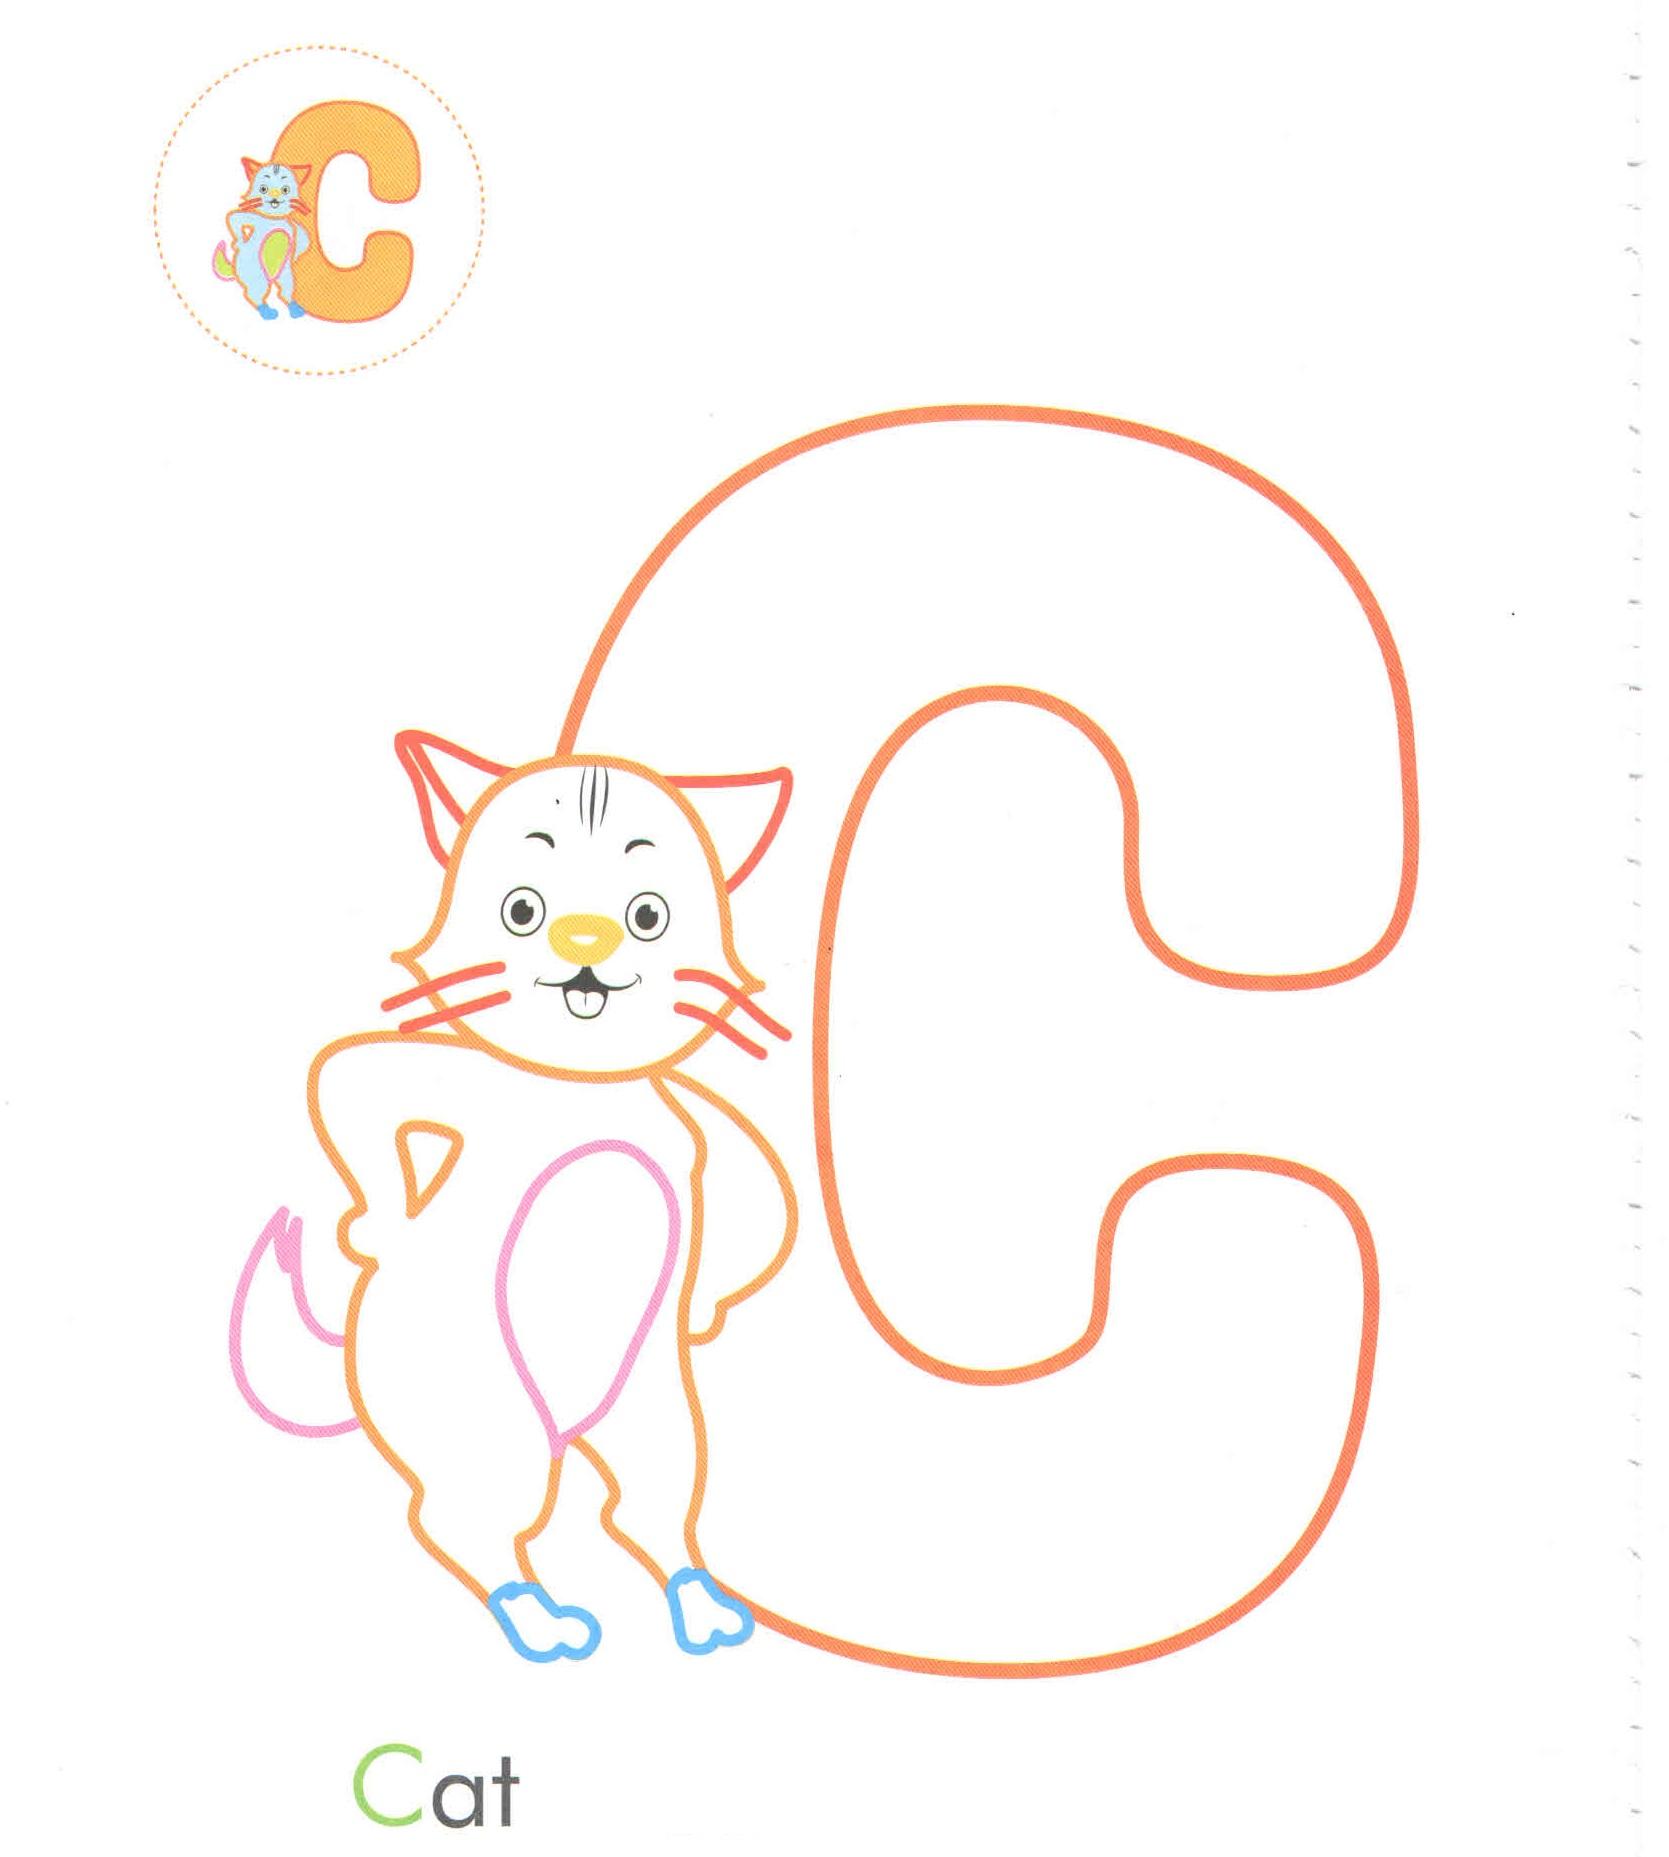 alphabet letter c cat coloring page for preschool preschool crafts. Black Bedroom Furniture Sets. Home Design Ideas